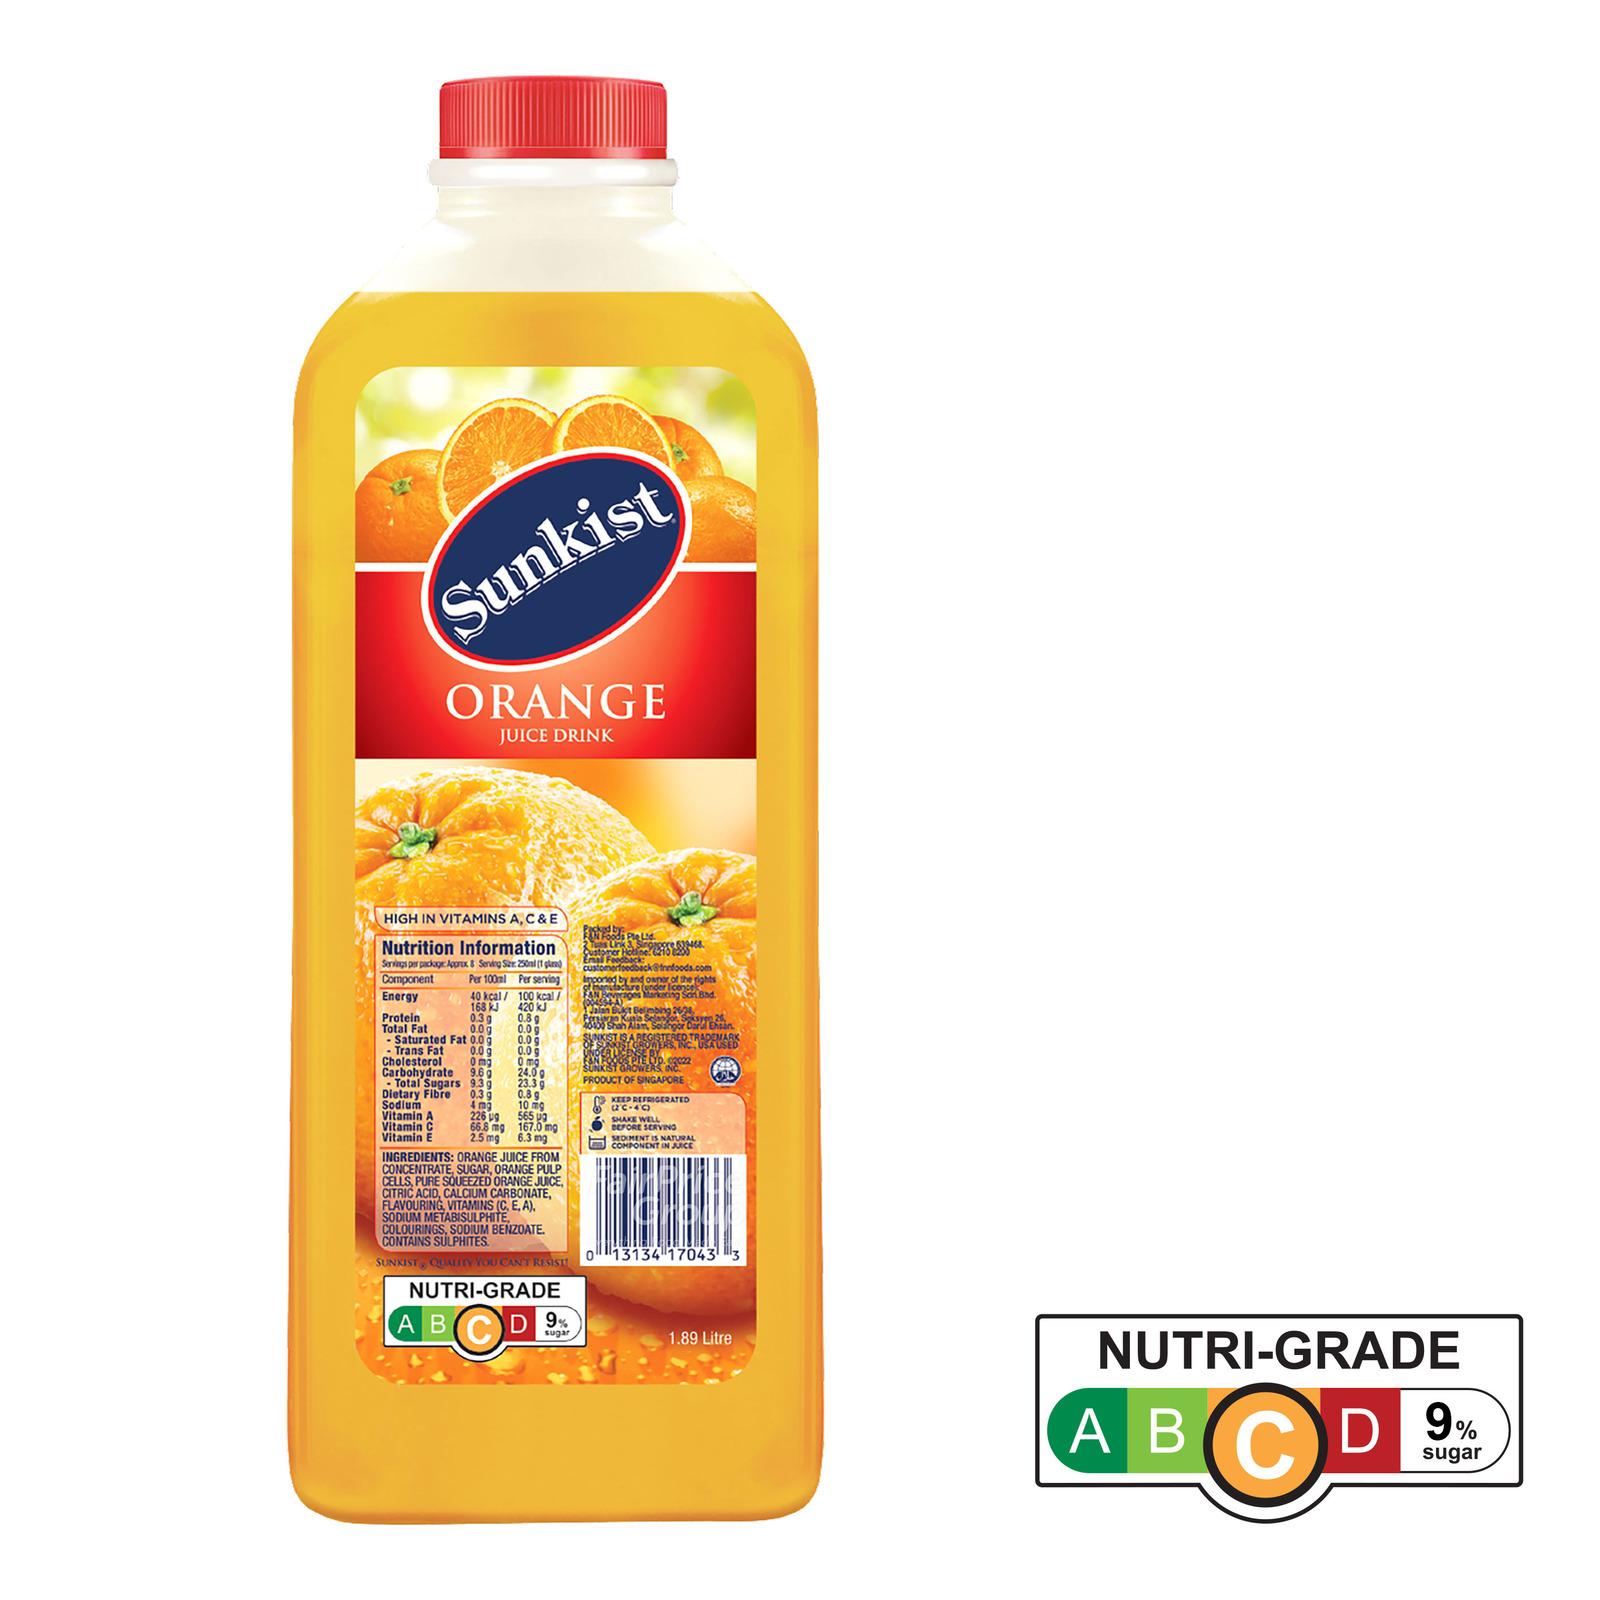 Sunkist Fruit Bottle Juice - Orange